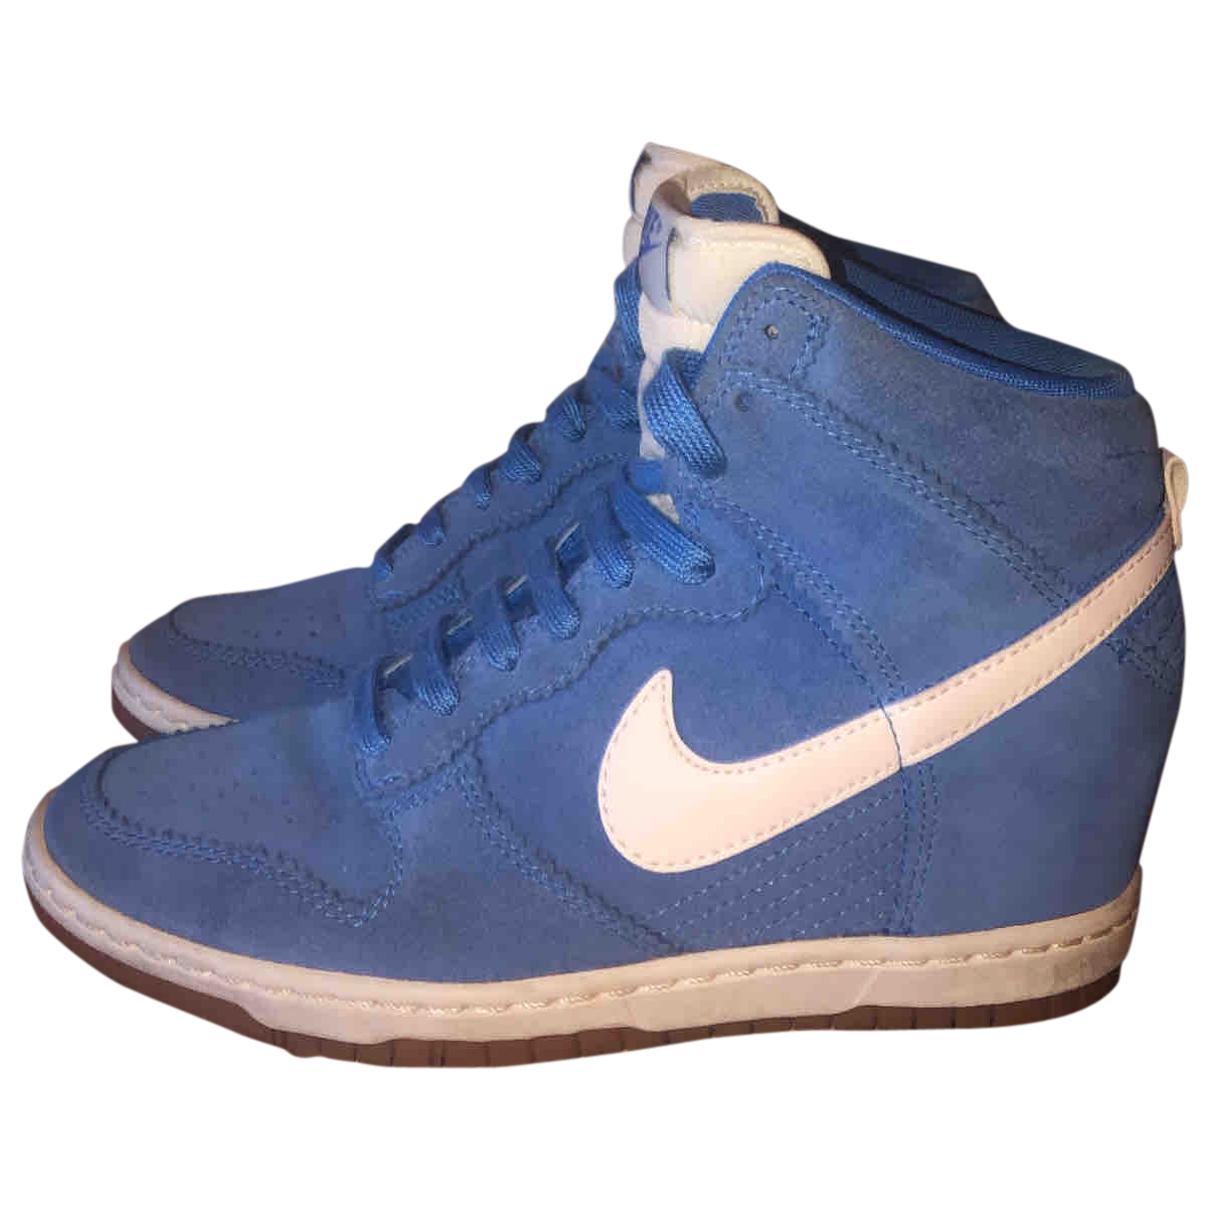 Nike \N Blue Suede Trainers for Women 38 EU